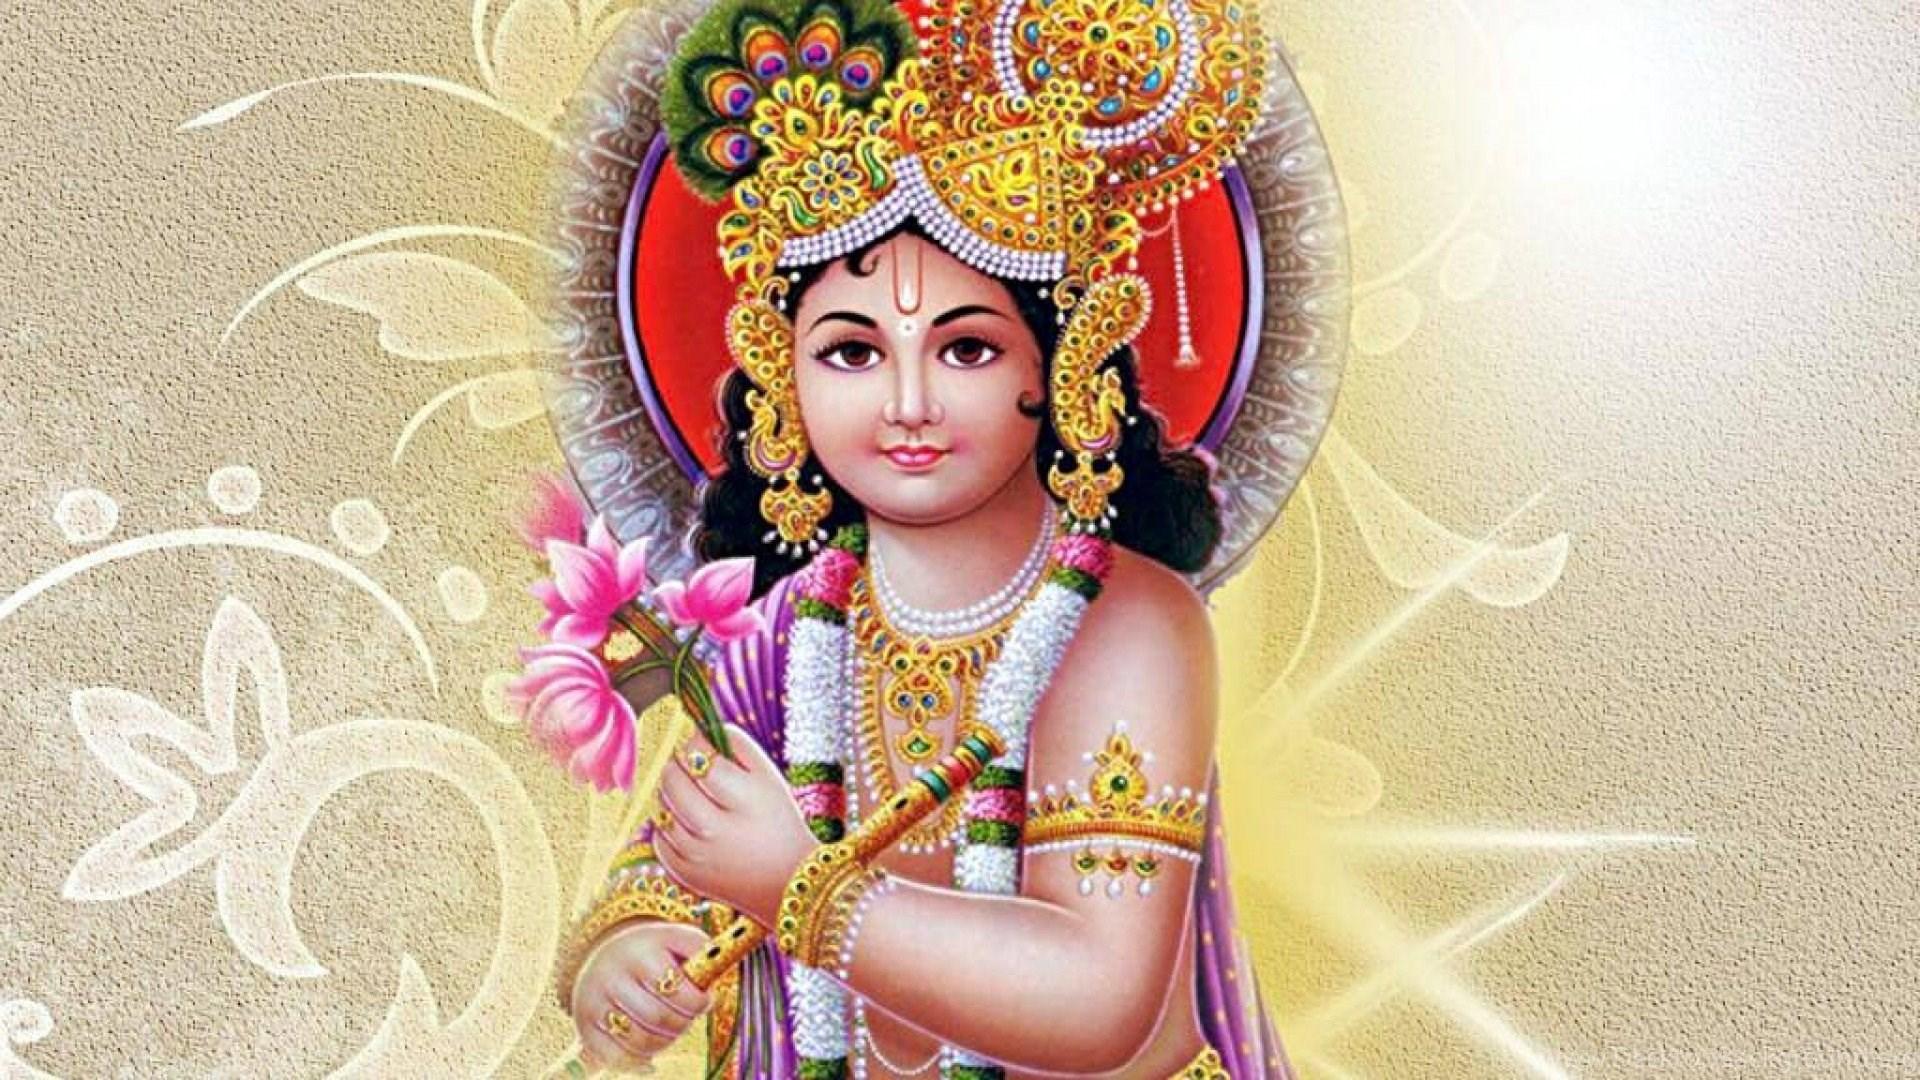 1920x1080 Lord Krishna Desktop Background